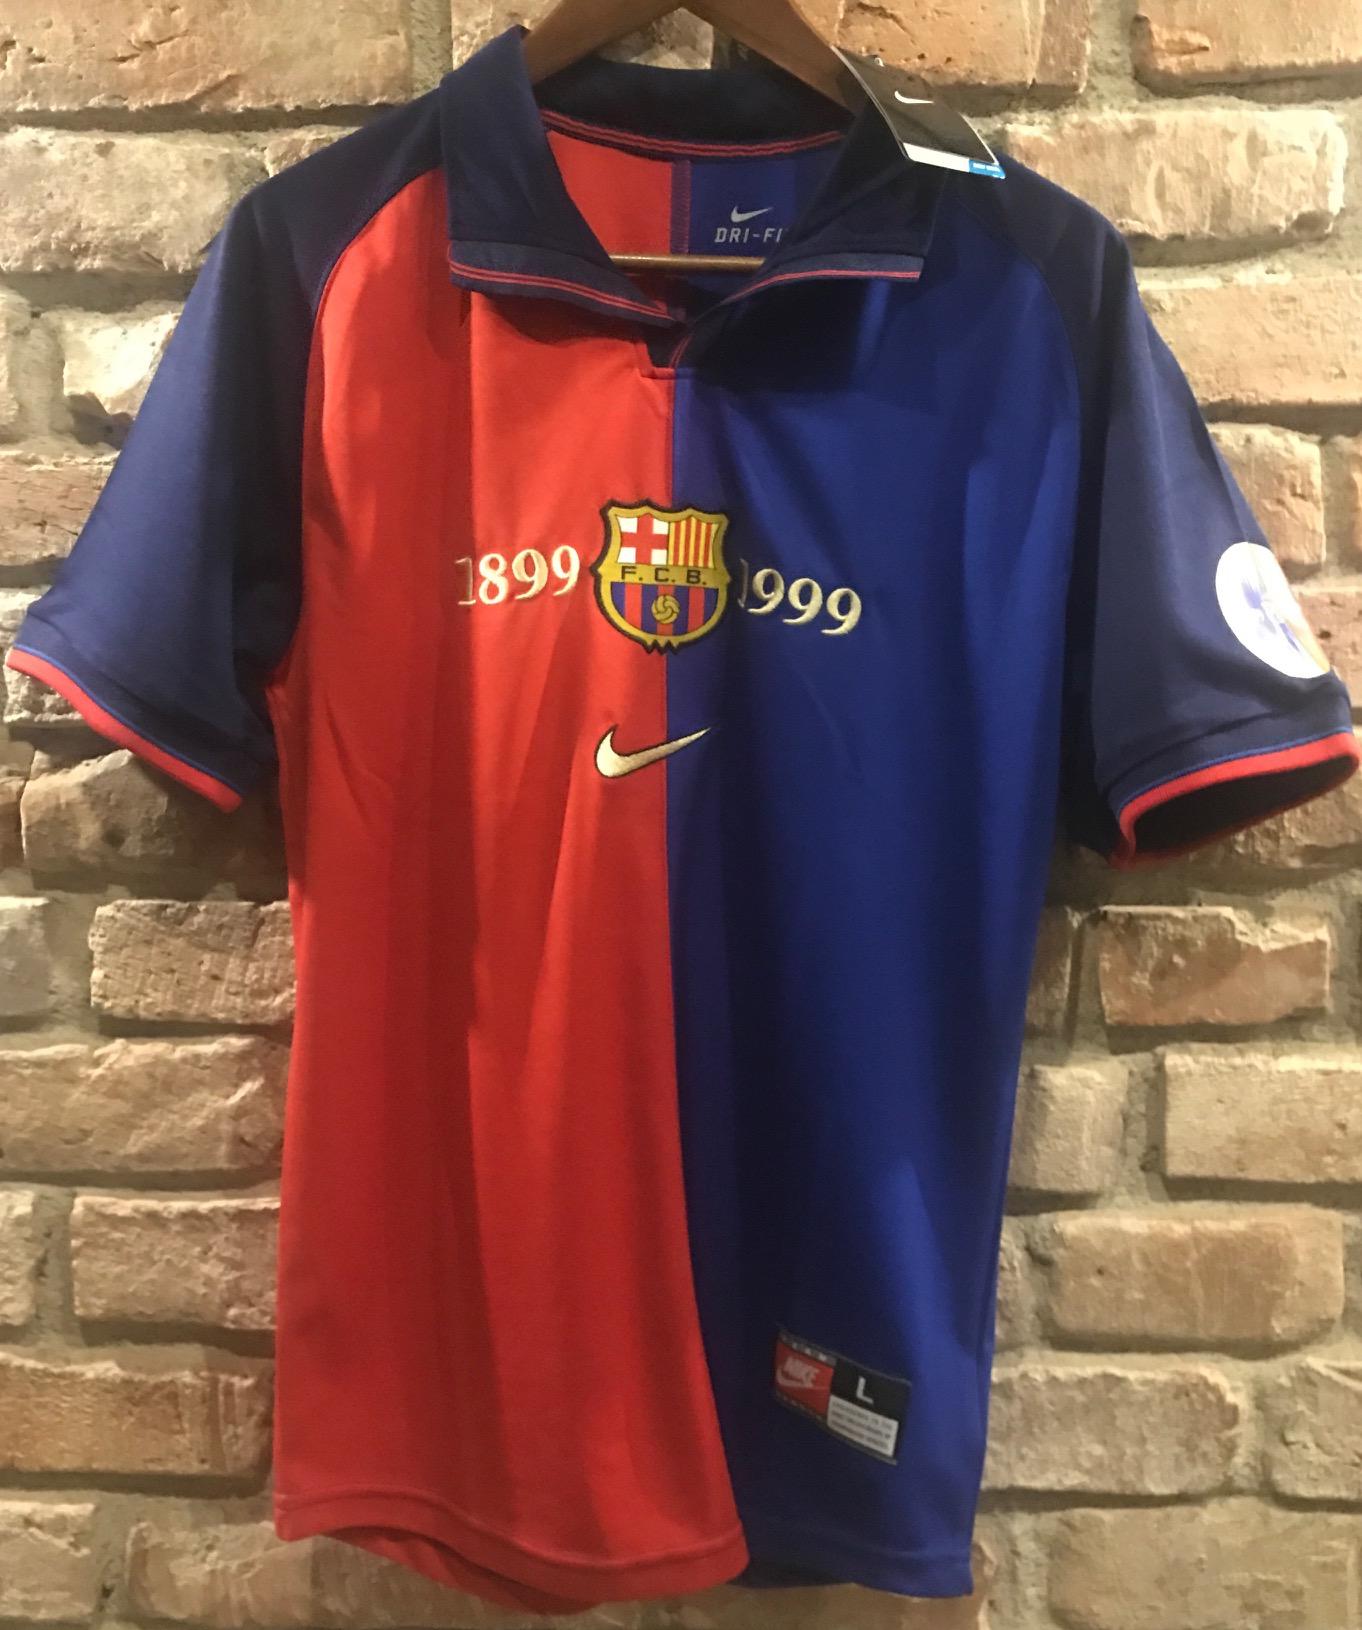 02cd2a548 FC BARCELONA Koszulka Nike Retro 1999 Guardiola! - 7154103500 ...